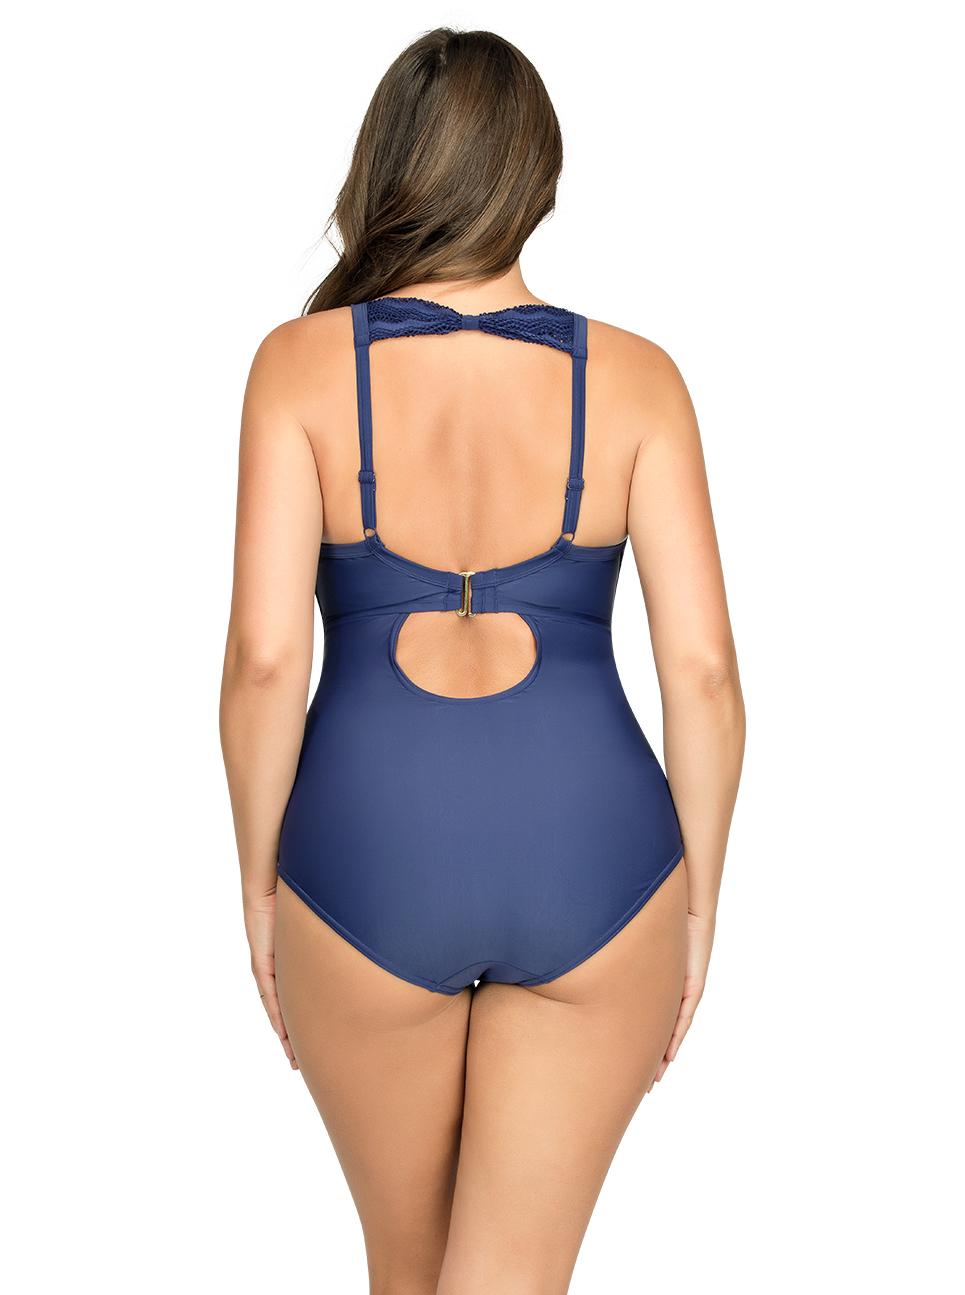 PARFAIT Keira OnePieceSwimsuitS8076 Twilight Back - Keira One-Piece Swimsuit Twilight S8076